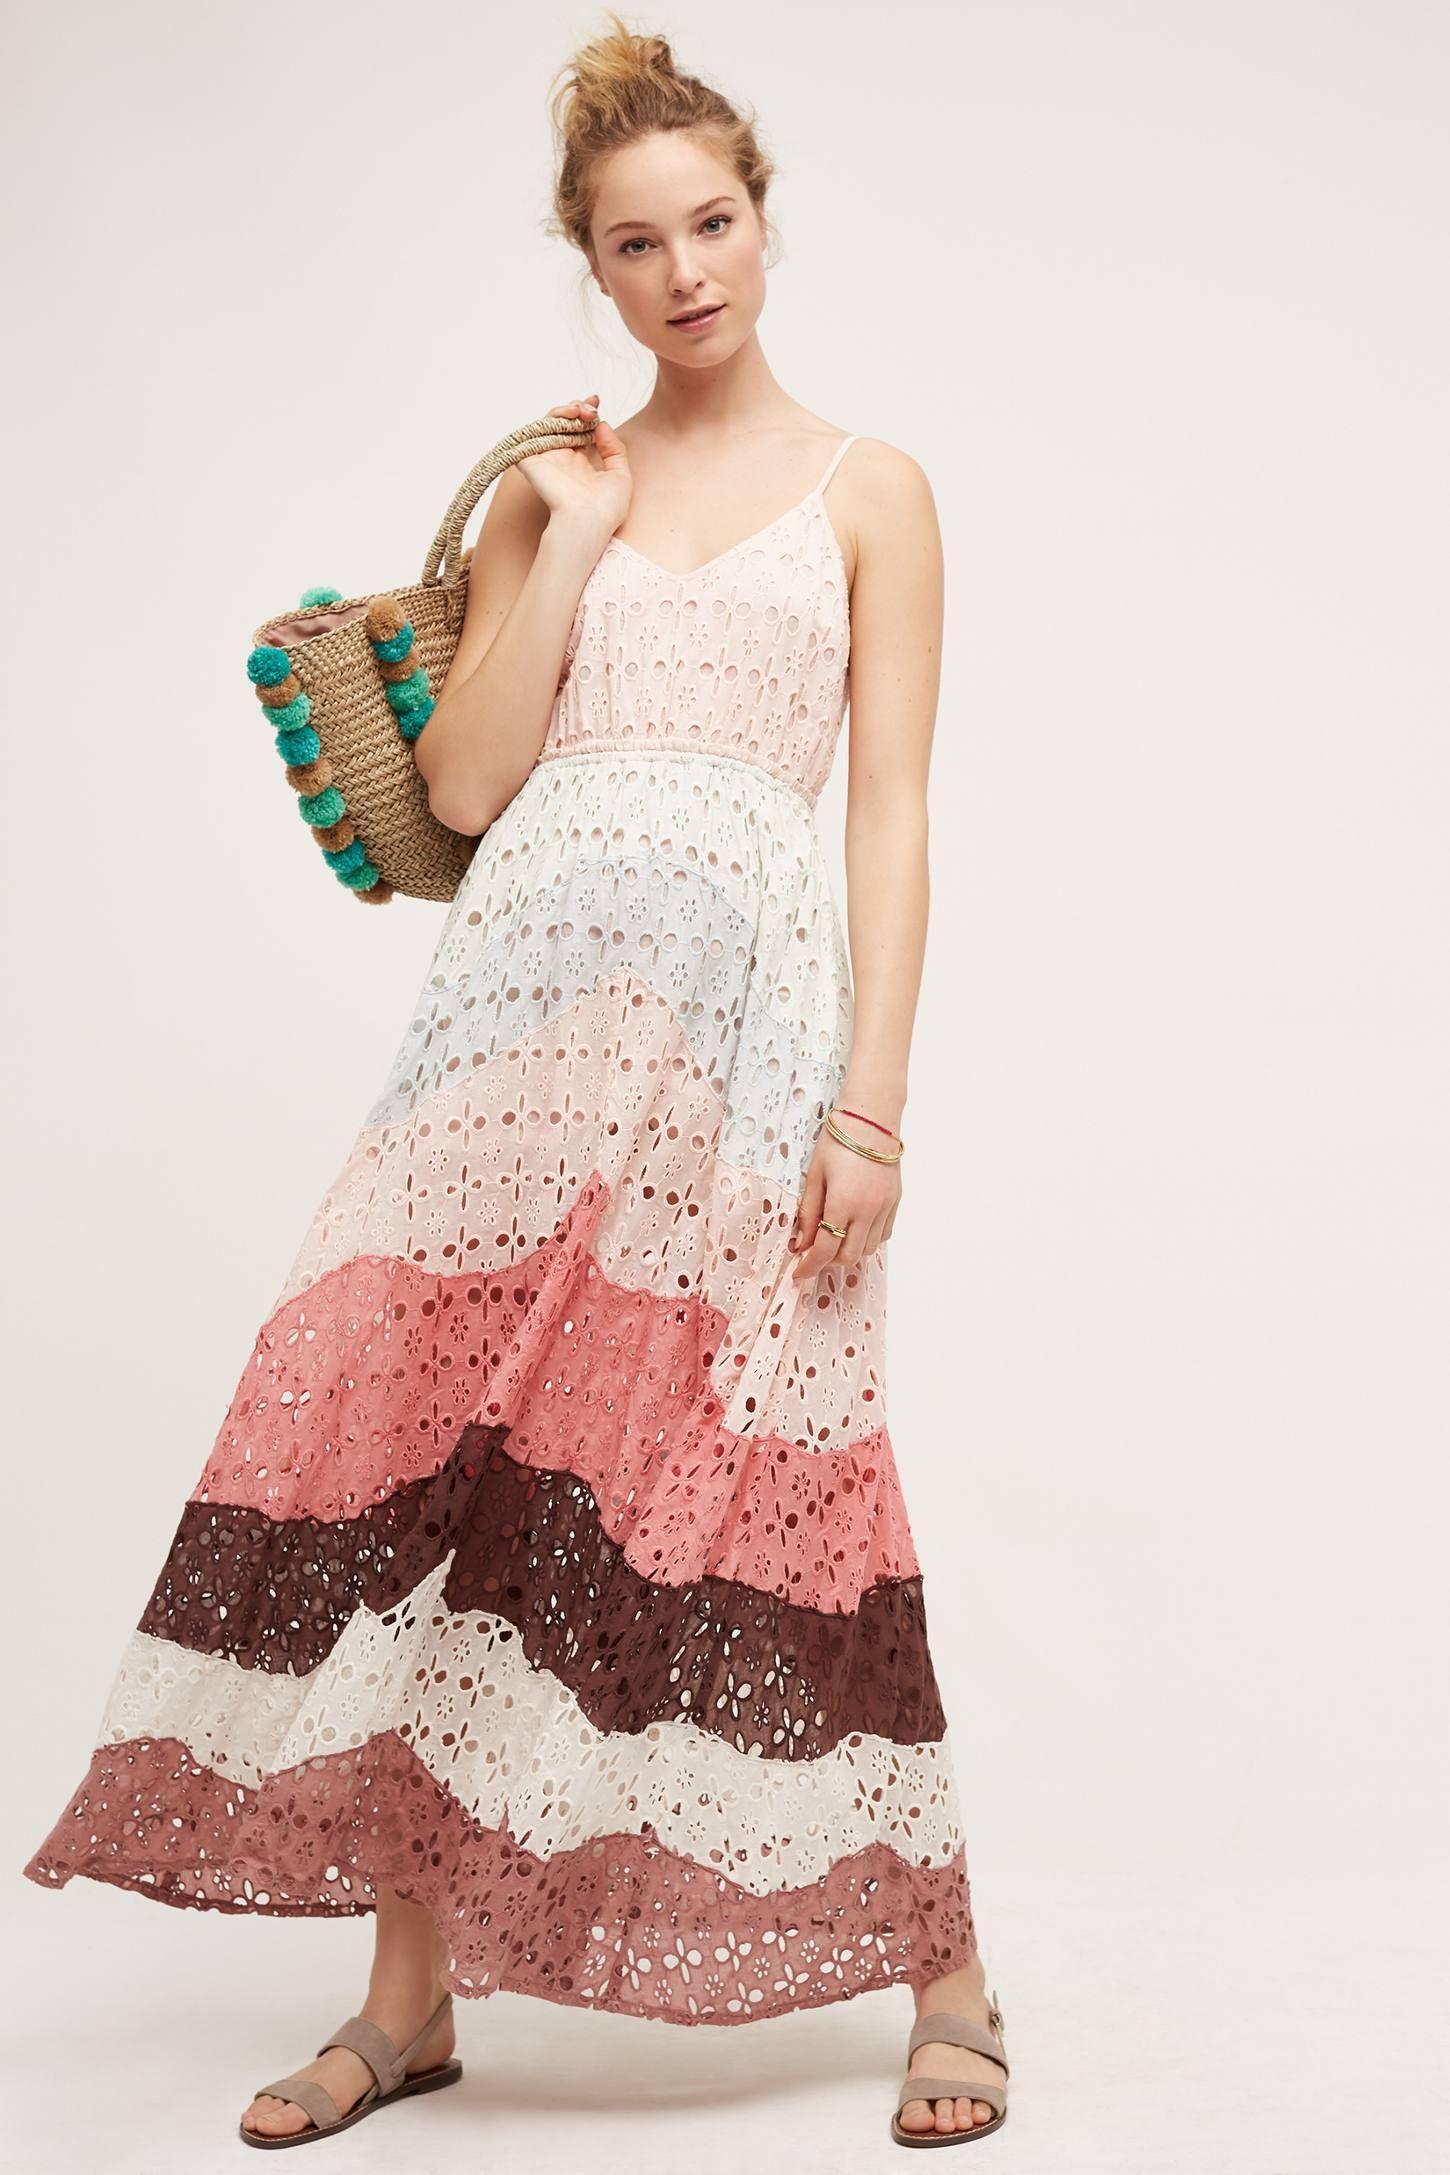 60a6bfb8ede3 Eyelet Maxi Dress | Anthropologie, Maxi dresses and Minimalist wardrobe